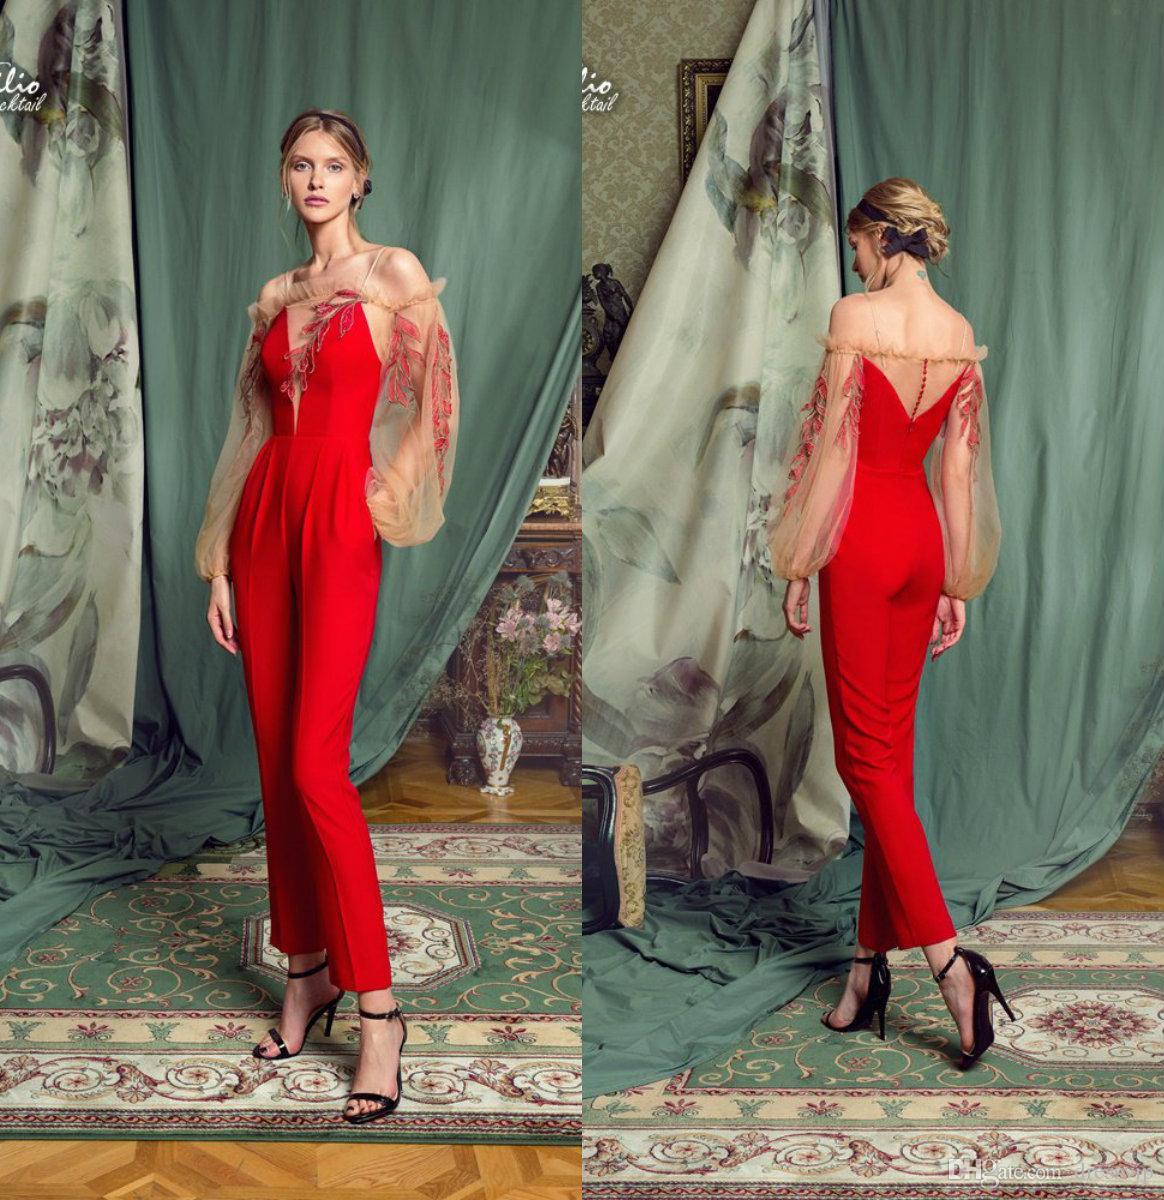 2361c134e1c 2019 Cocktail Dresses Fashion Women Jumpsuits Off The Shoulder Lace  Appliqued Long Sleeve Prom Dress Elegant Evening Gowns Funky Cocktail  Dresses Plus Sized ...